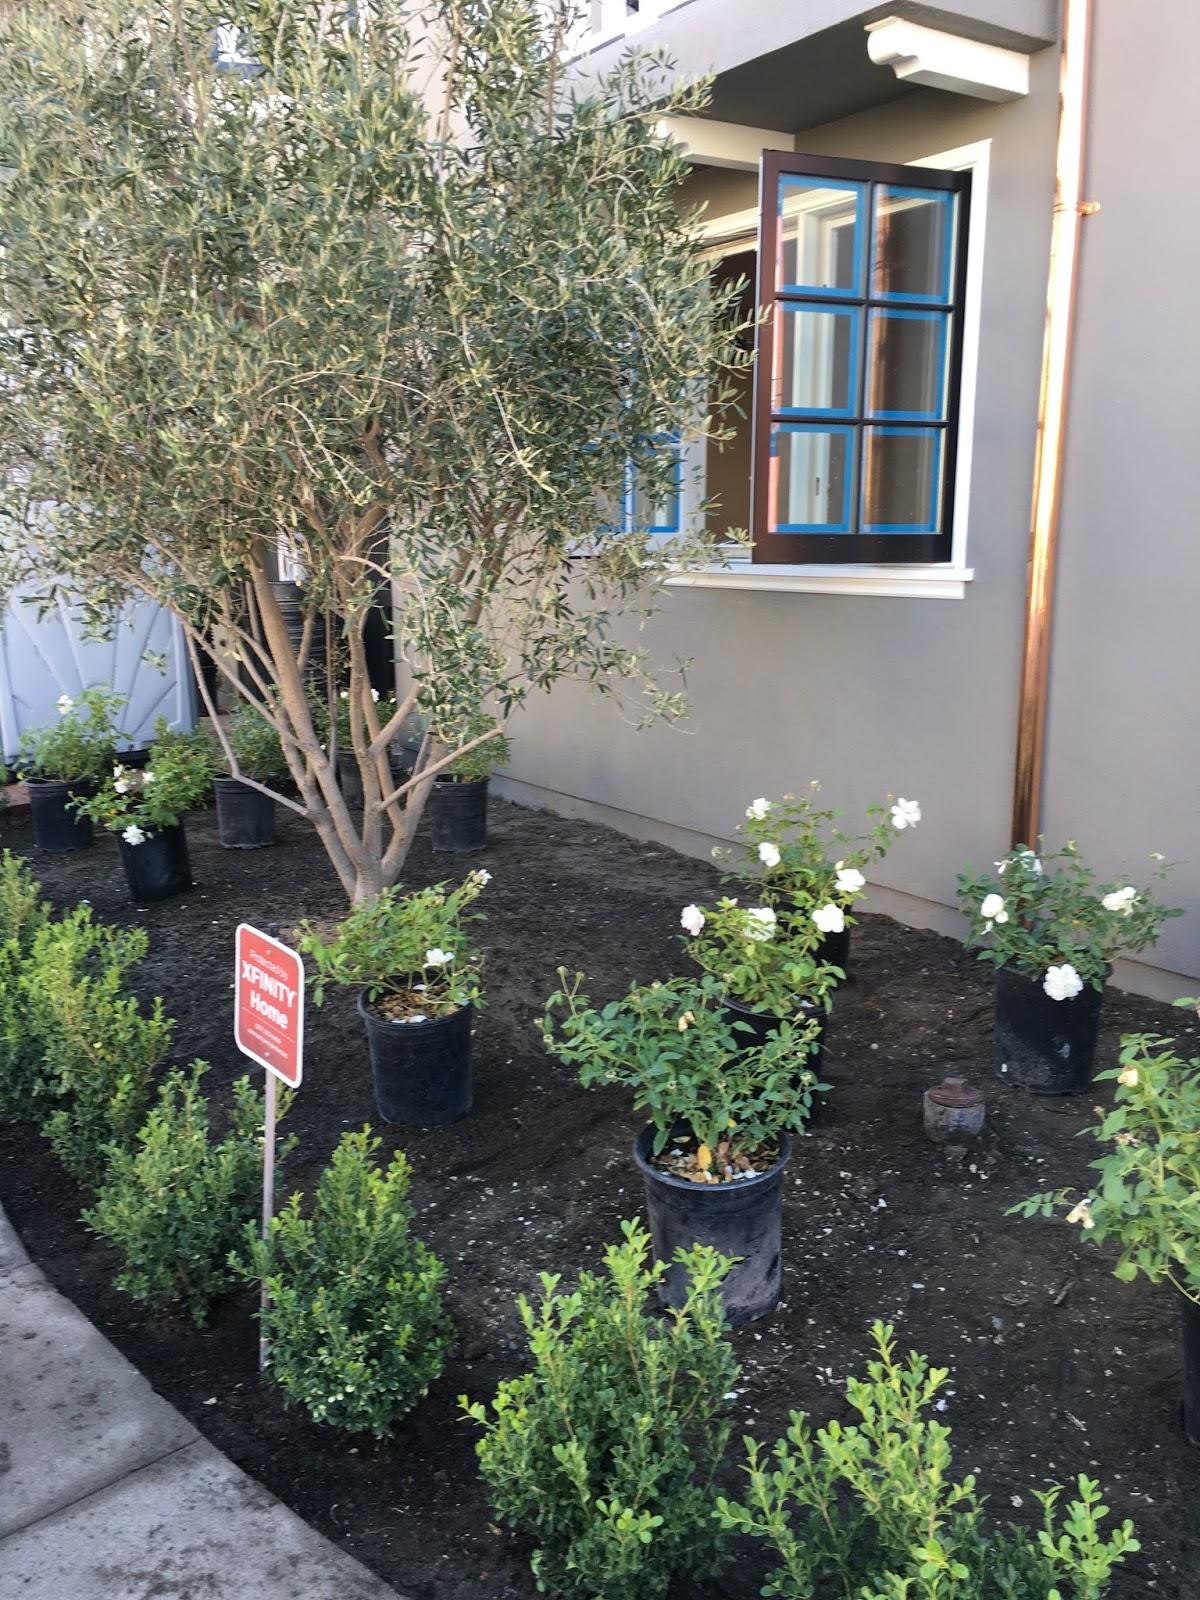 Vignette design exterior progress paint and landscape for Xd garden design